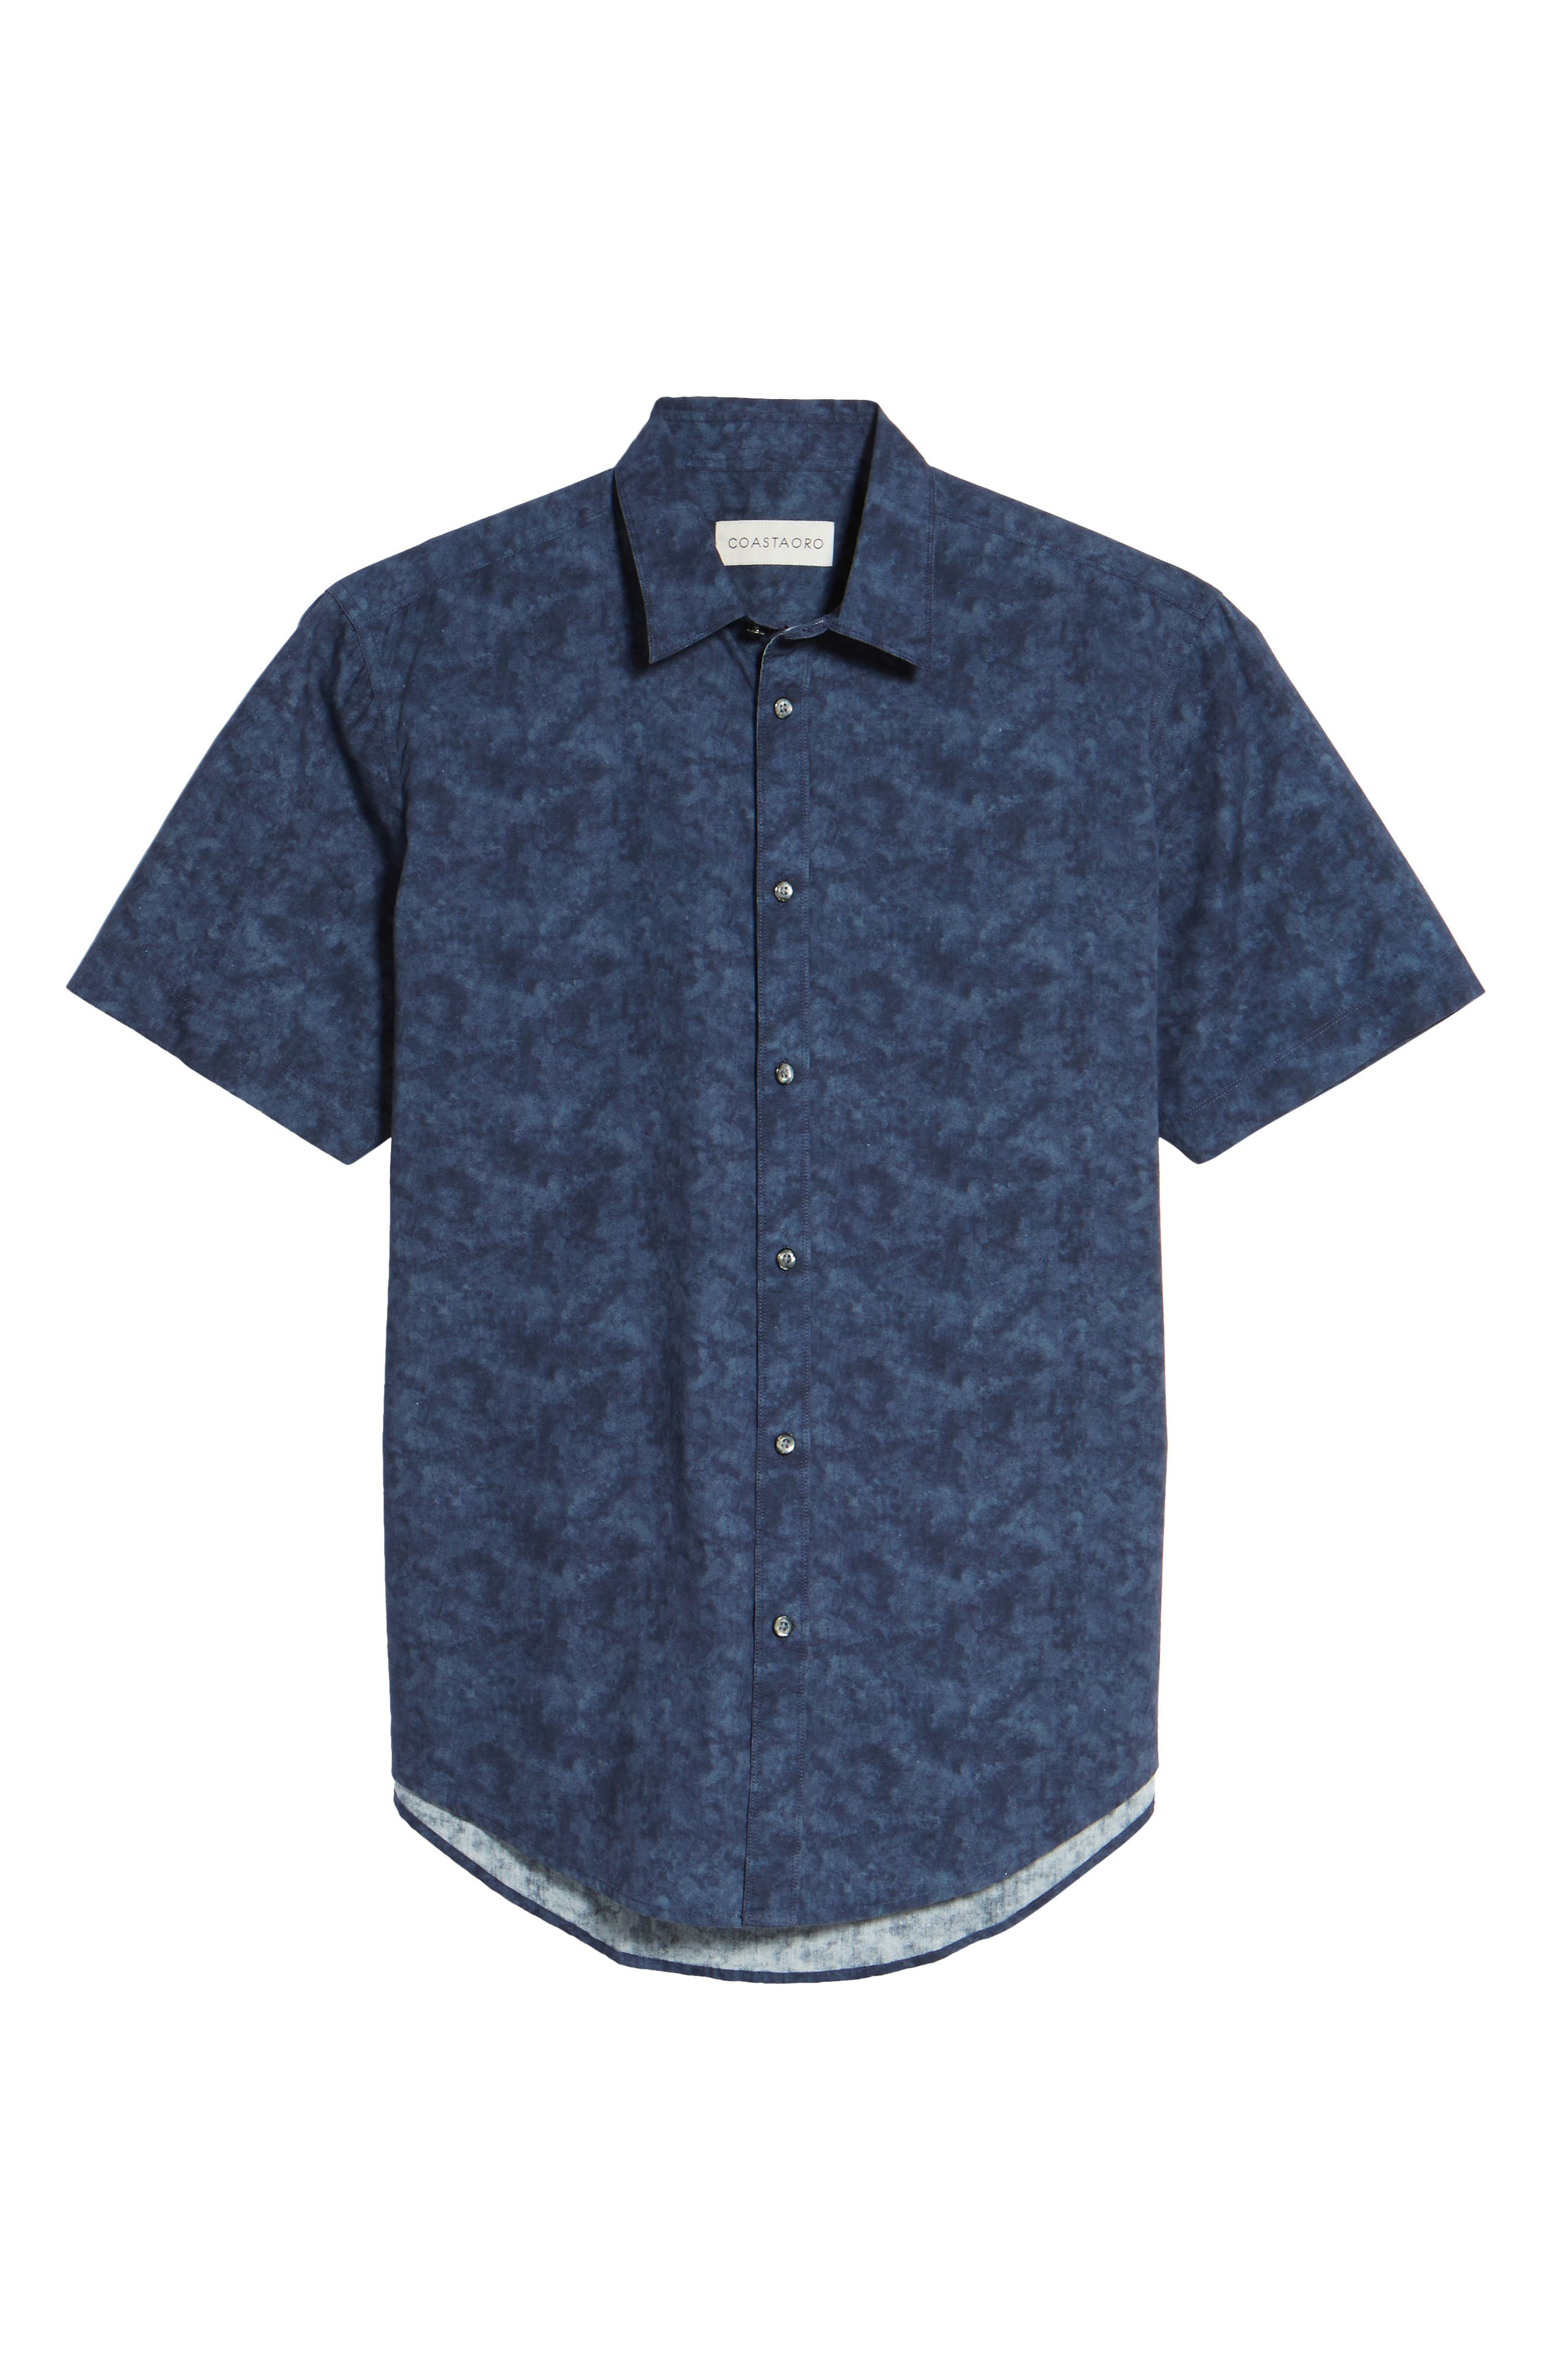 Alternate Image 6  - Coastaoro Seaside Regular Fit Print Sport Shirt